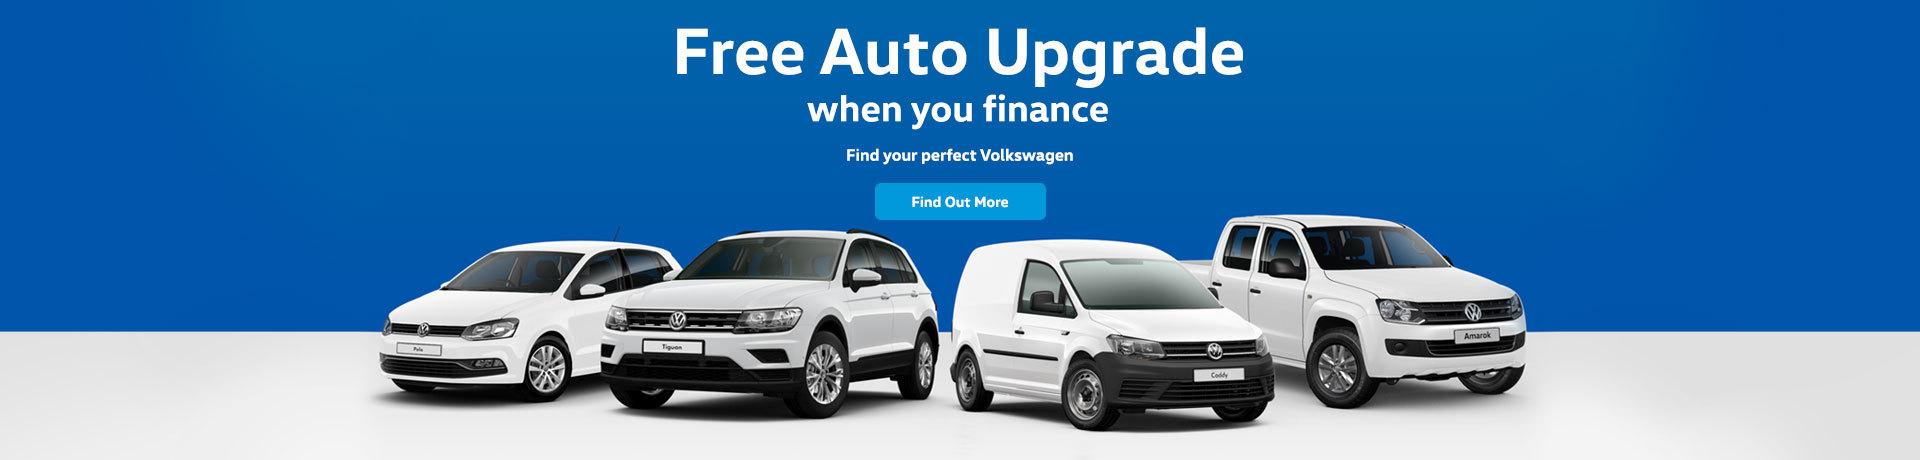 Volkswagen - Free Auto upgrade when you finance